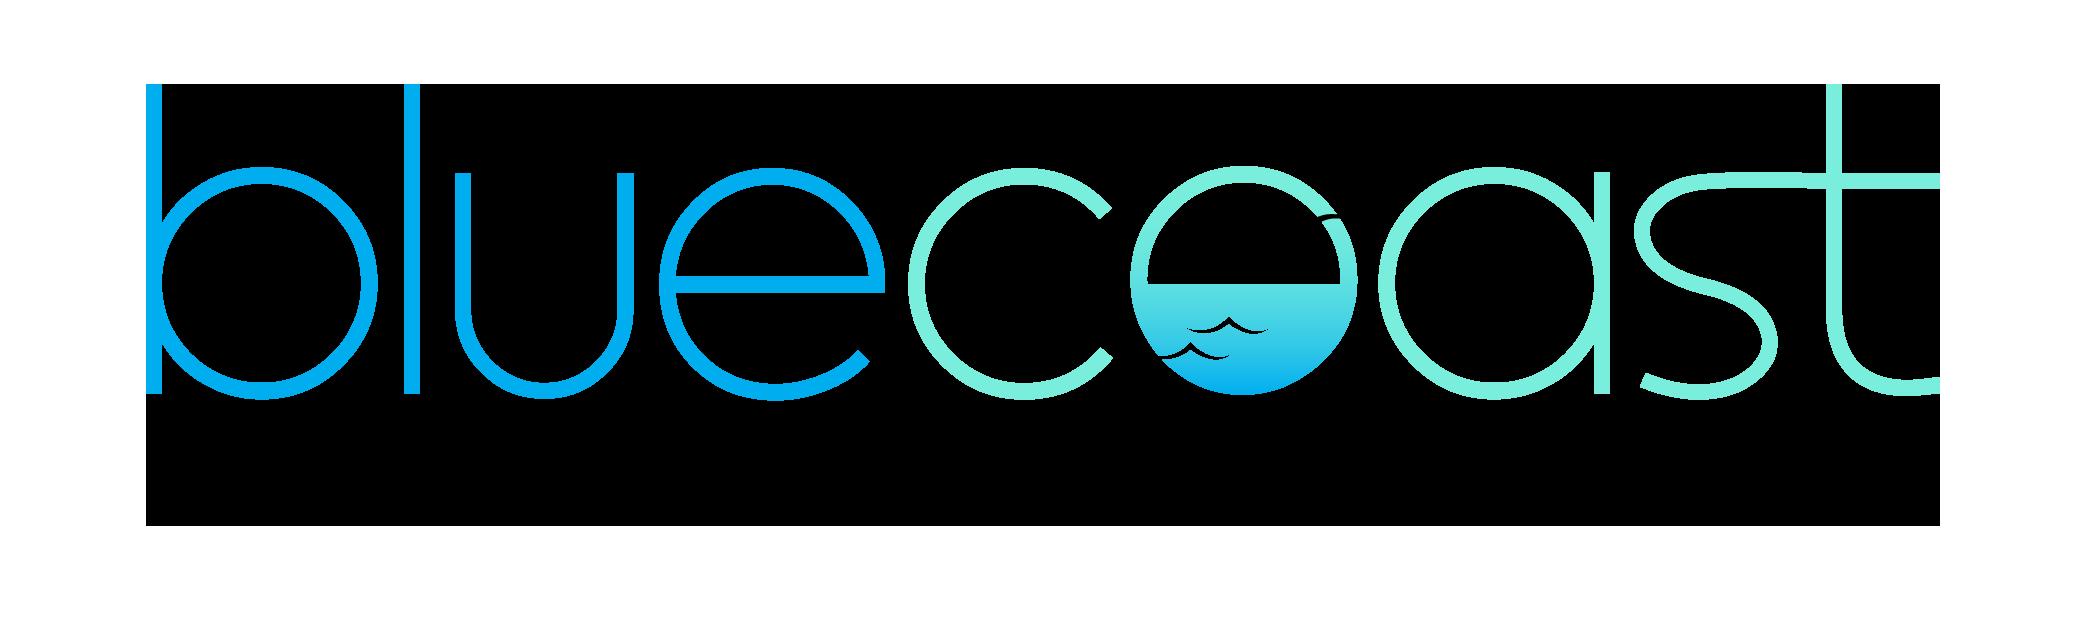 BlueCoastNutrition_logo.png